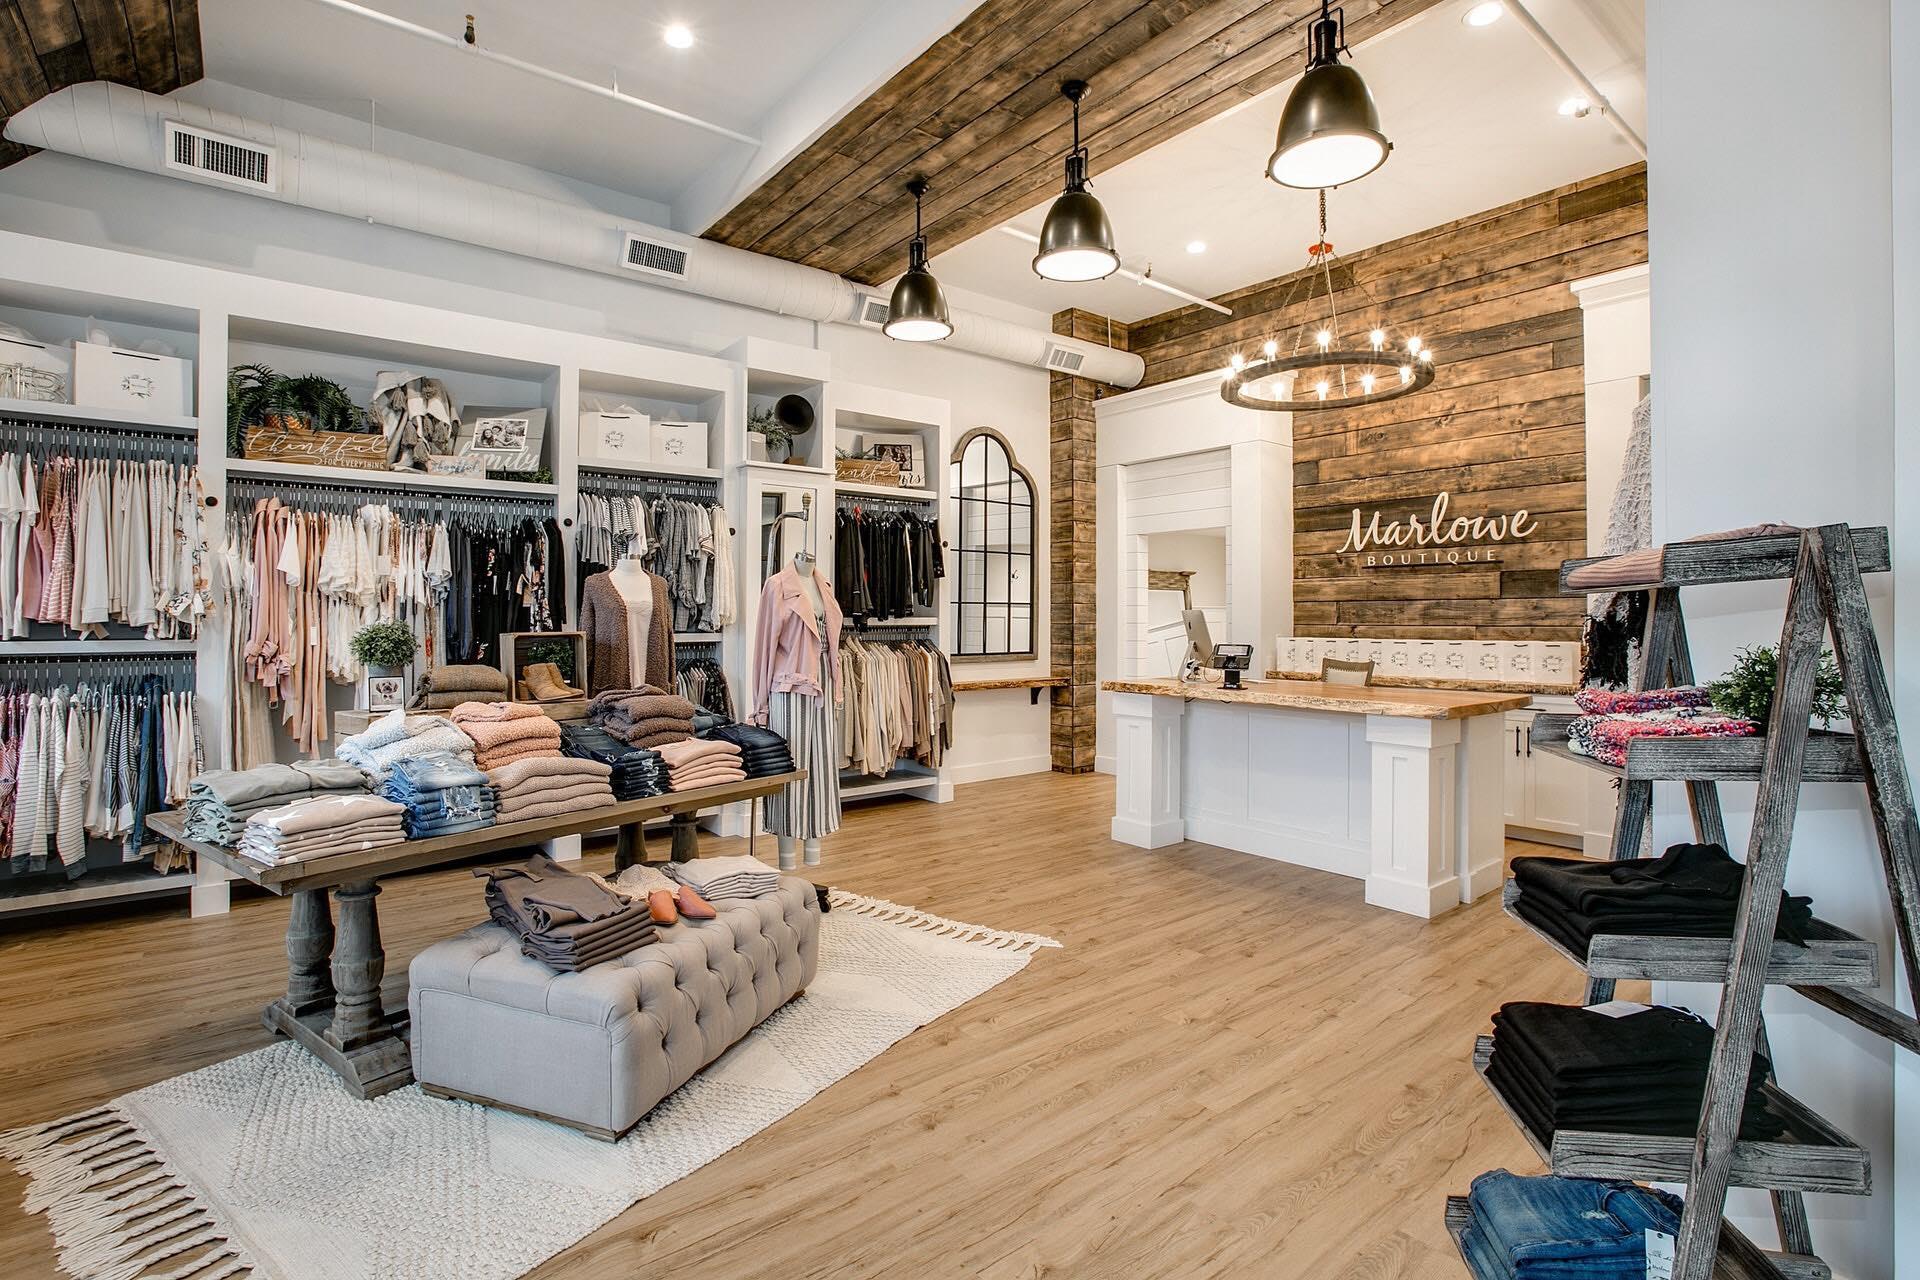 Marlowe Boutique